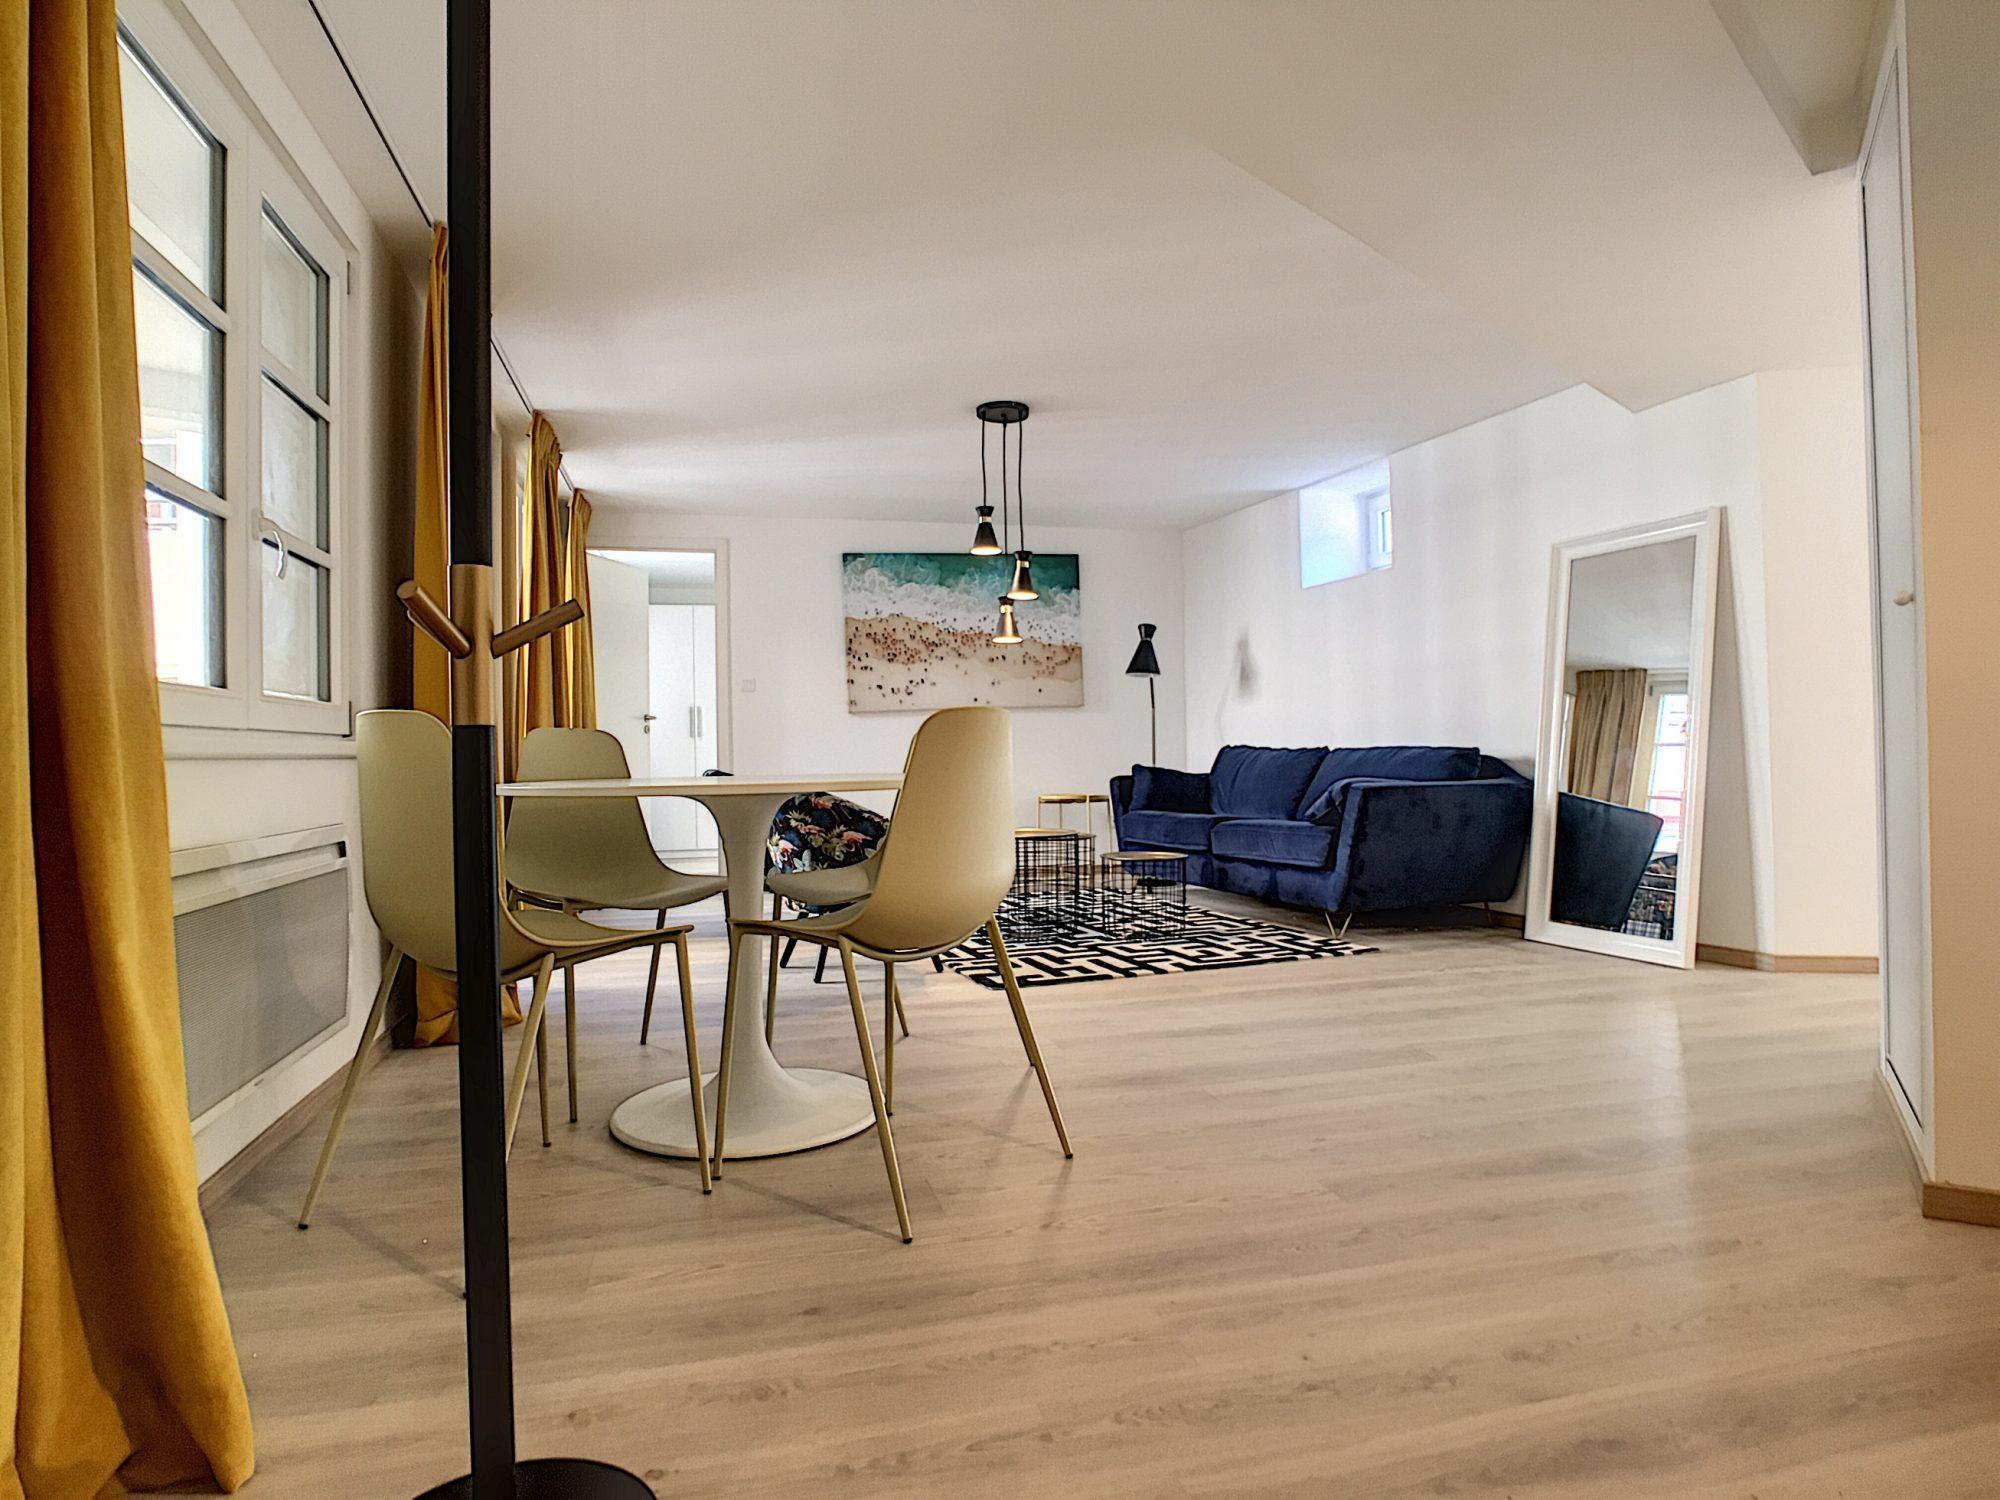 [Atypique] Splendide 2 pièces meublé avec terrasse – Petite France / quai Turckheim - nos locations - Beausite Immobilier 4